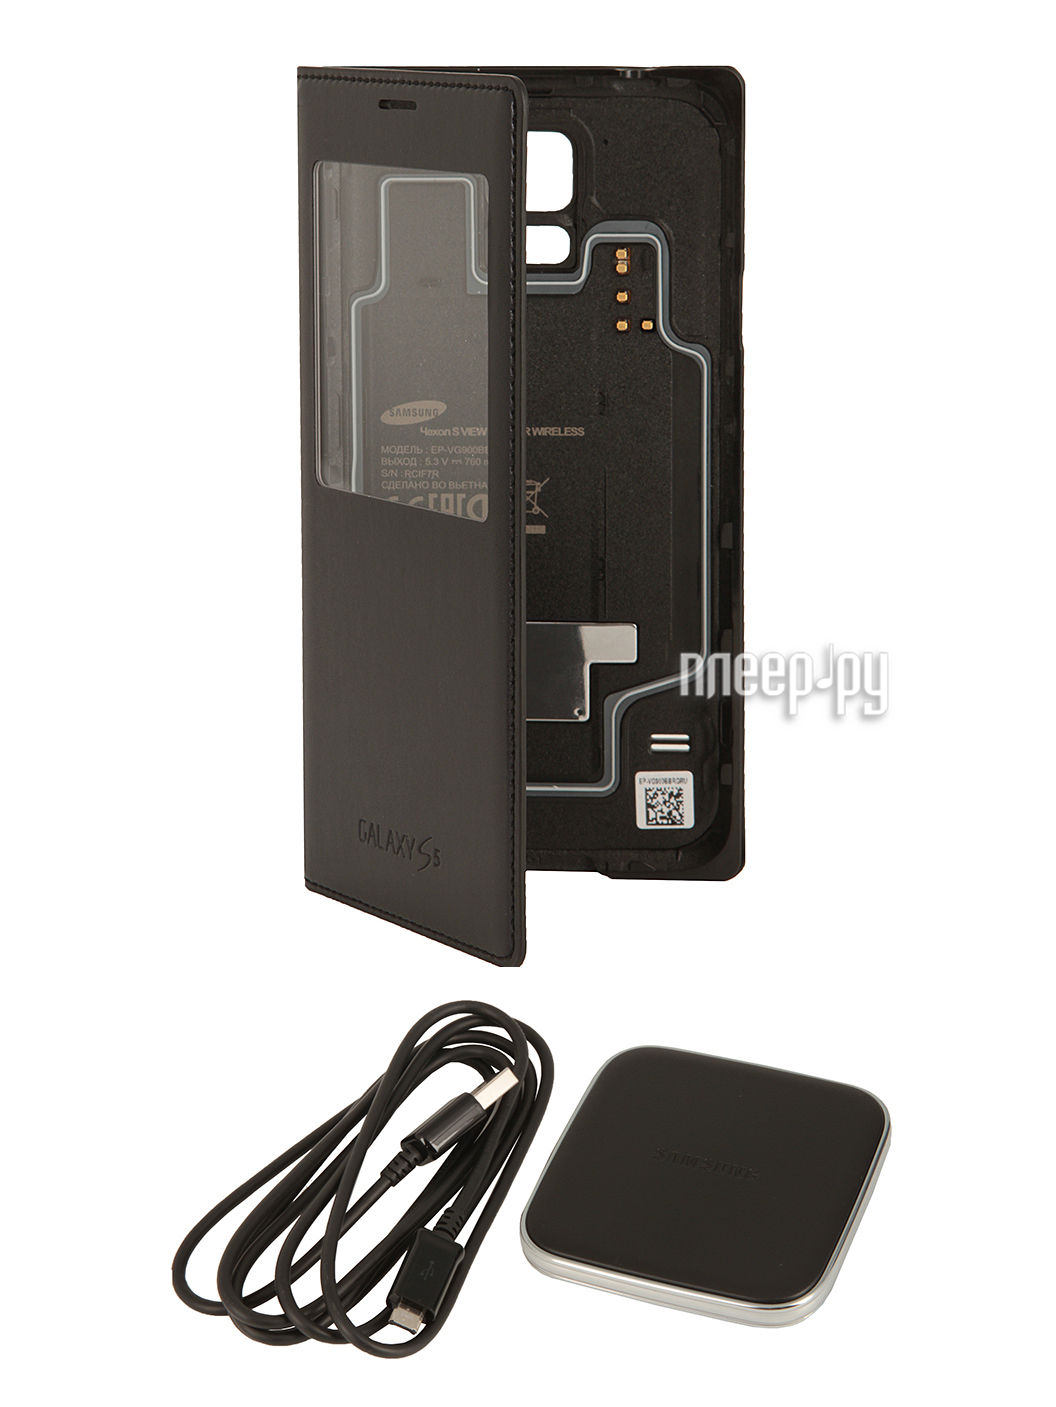 Аксессуар Чехол Samsung SM-G900F Galaxy S5 S-View EP-KG900PBRGRU Black  Pleer.ru  2918.000